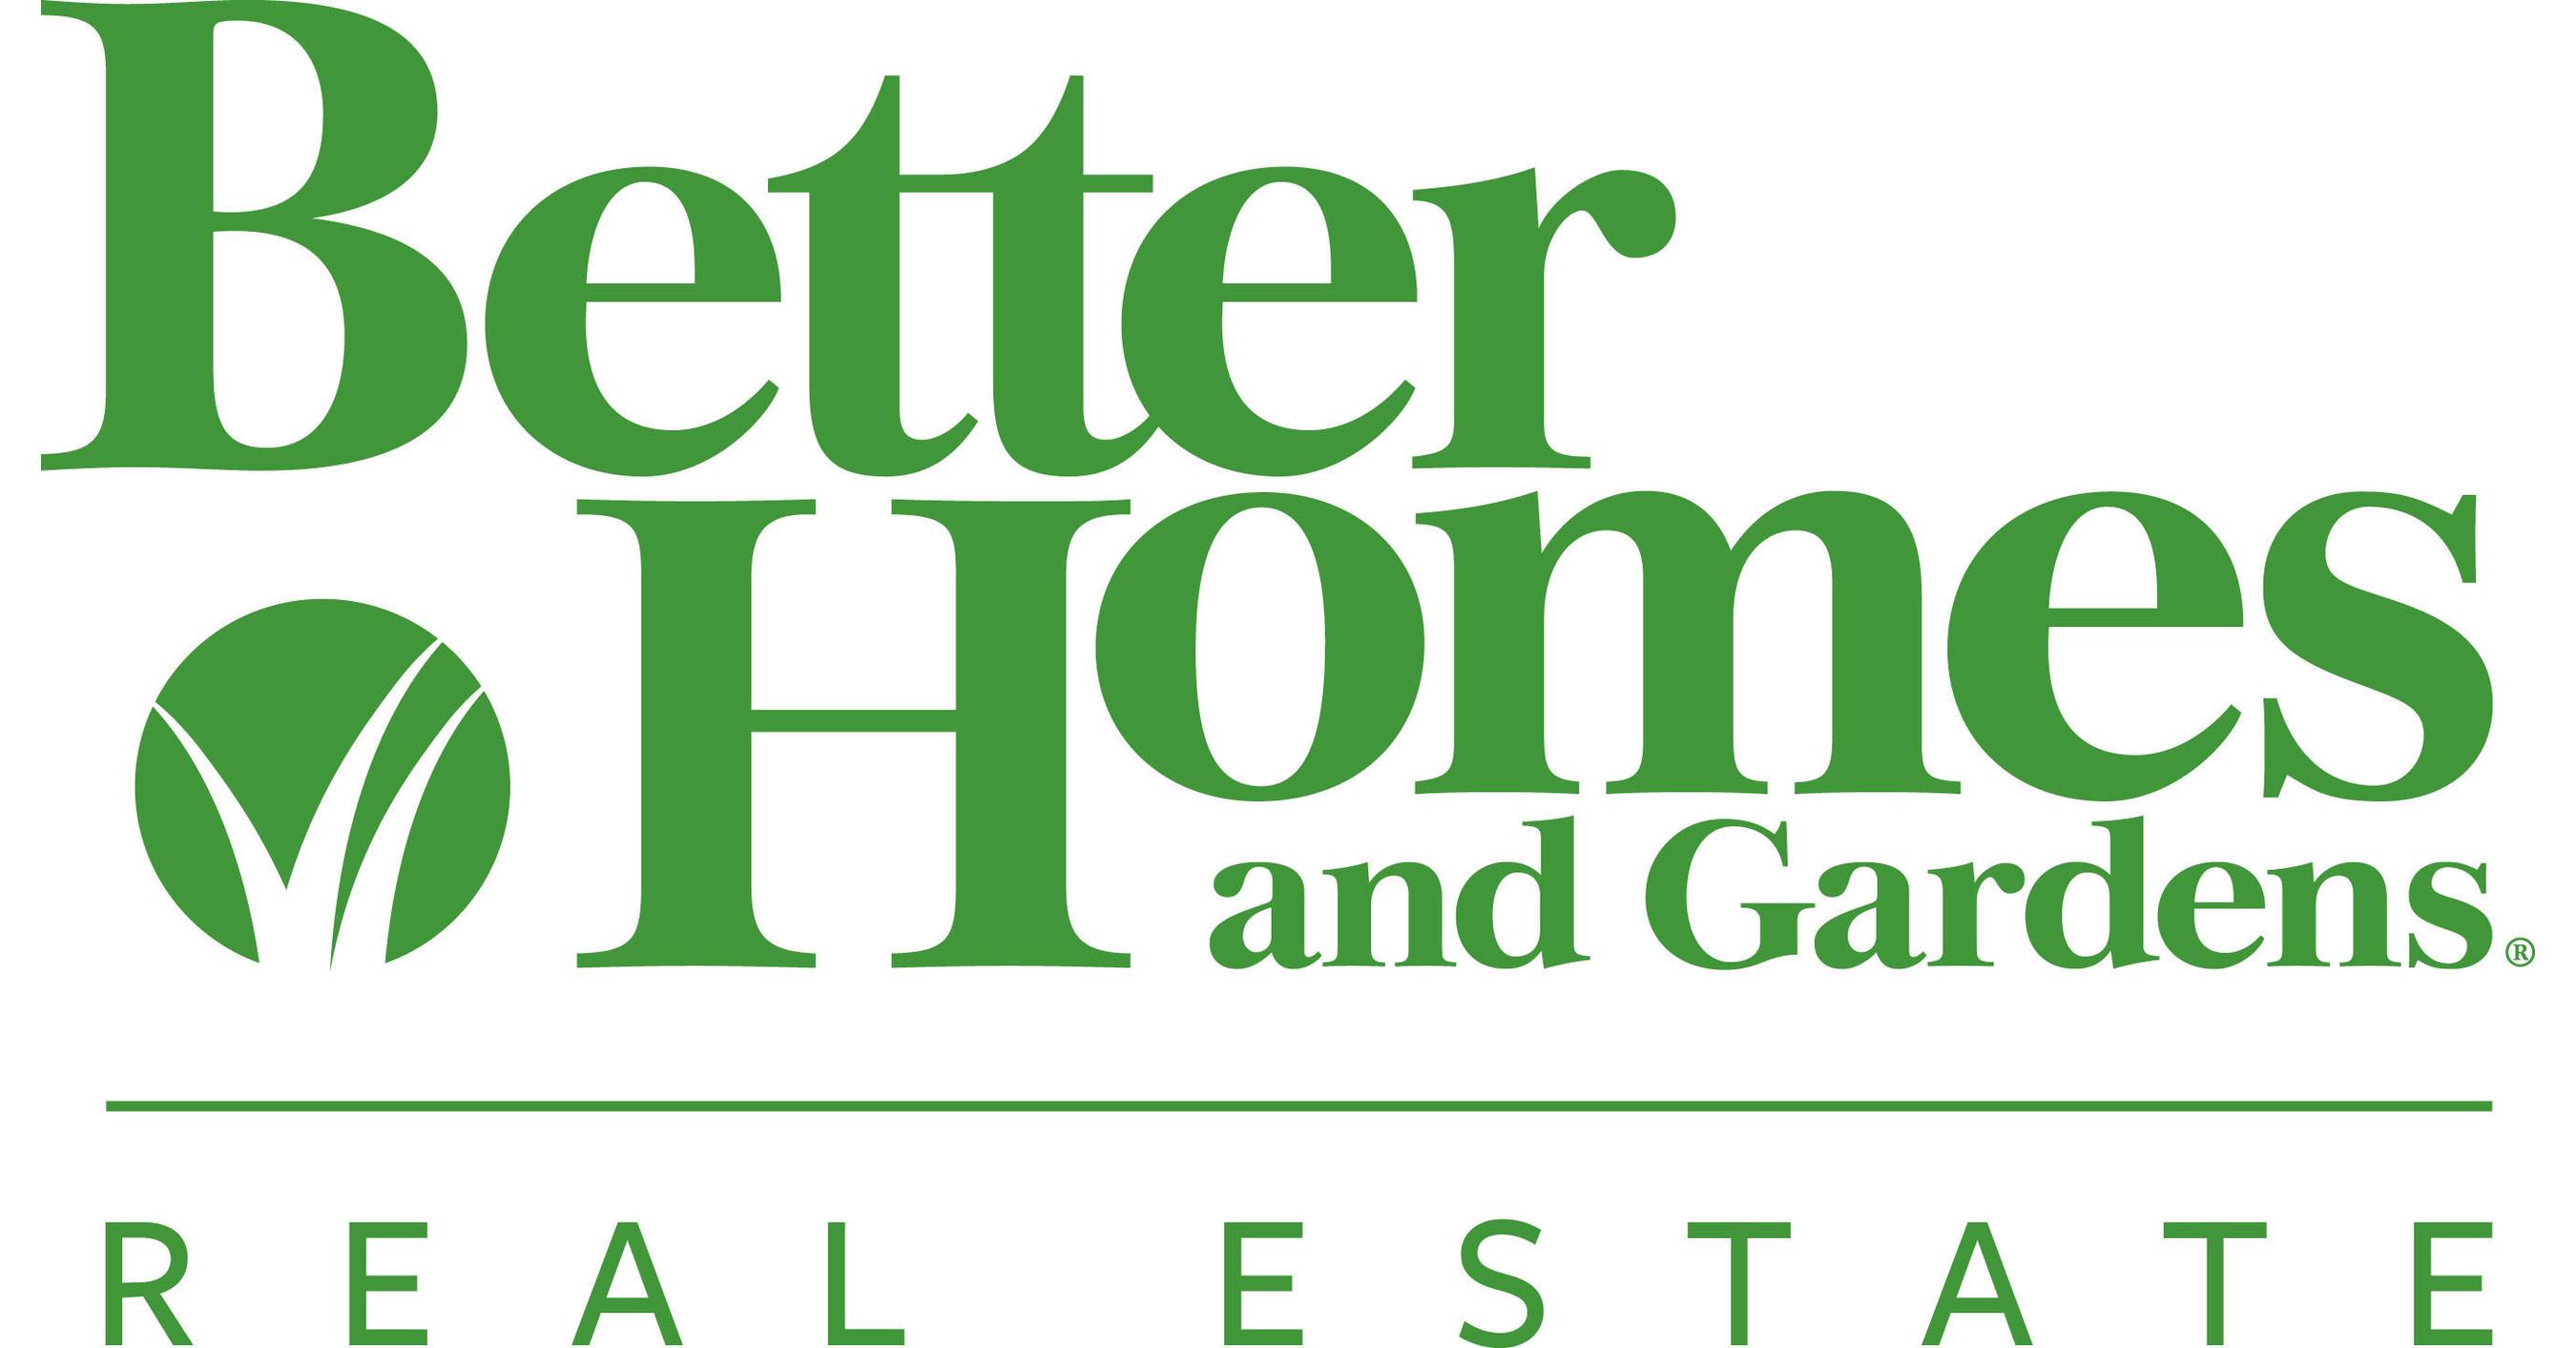 BETTER HOMES AND GARDENS REAL ESTATE LLC LOGO jpg?p=facebook.